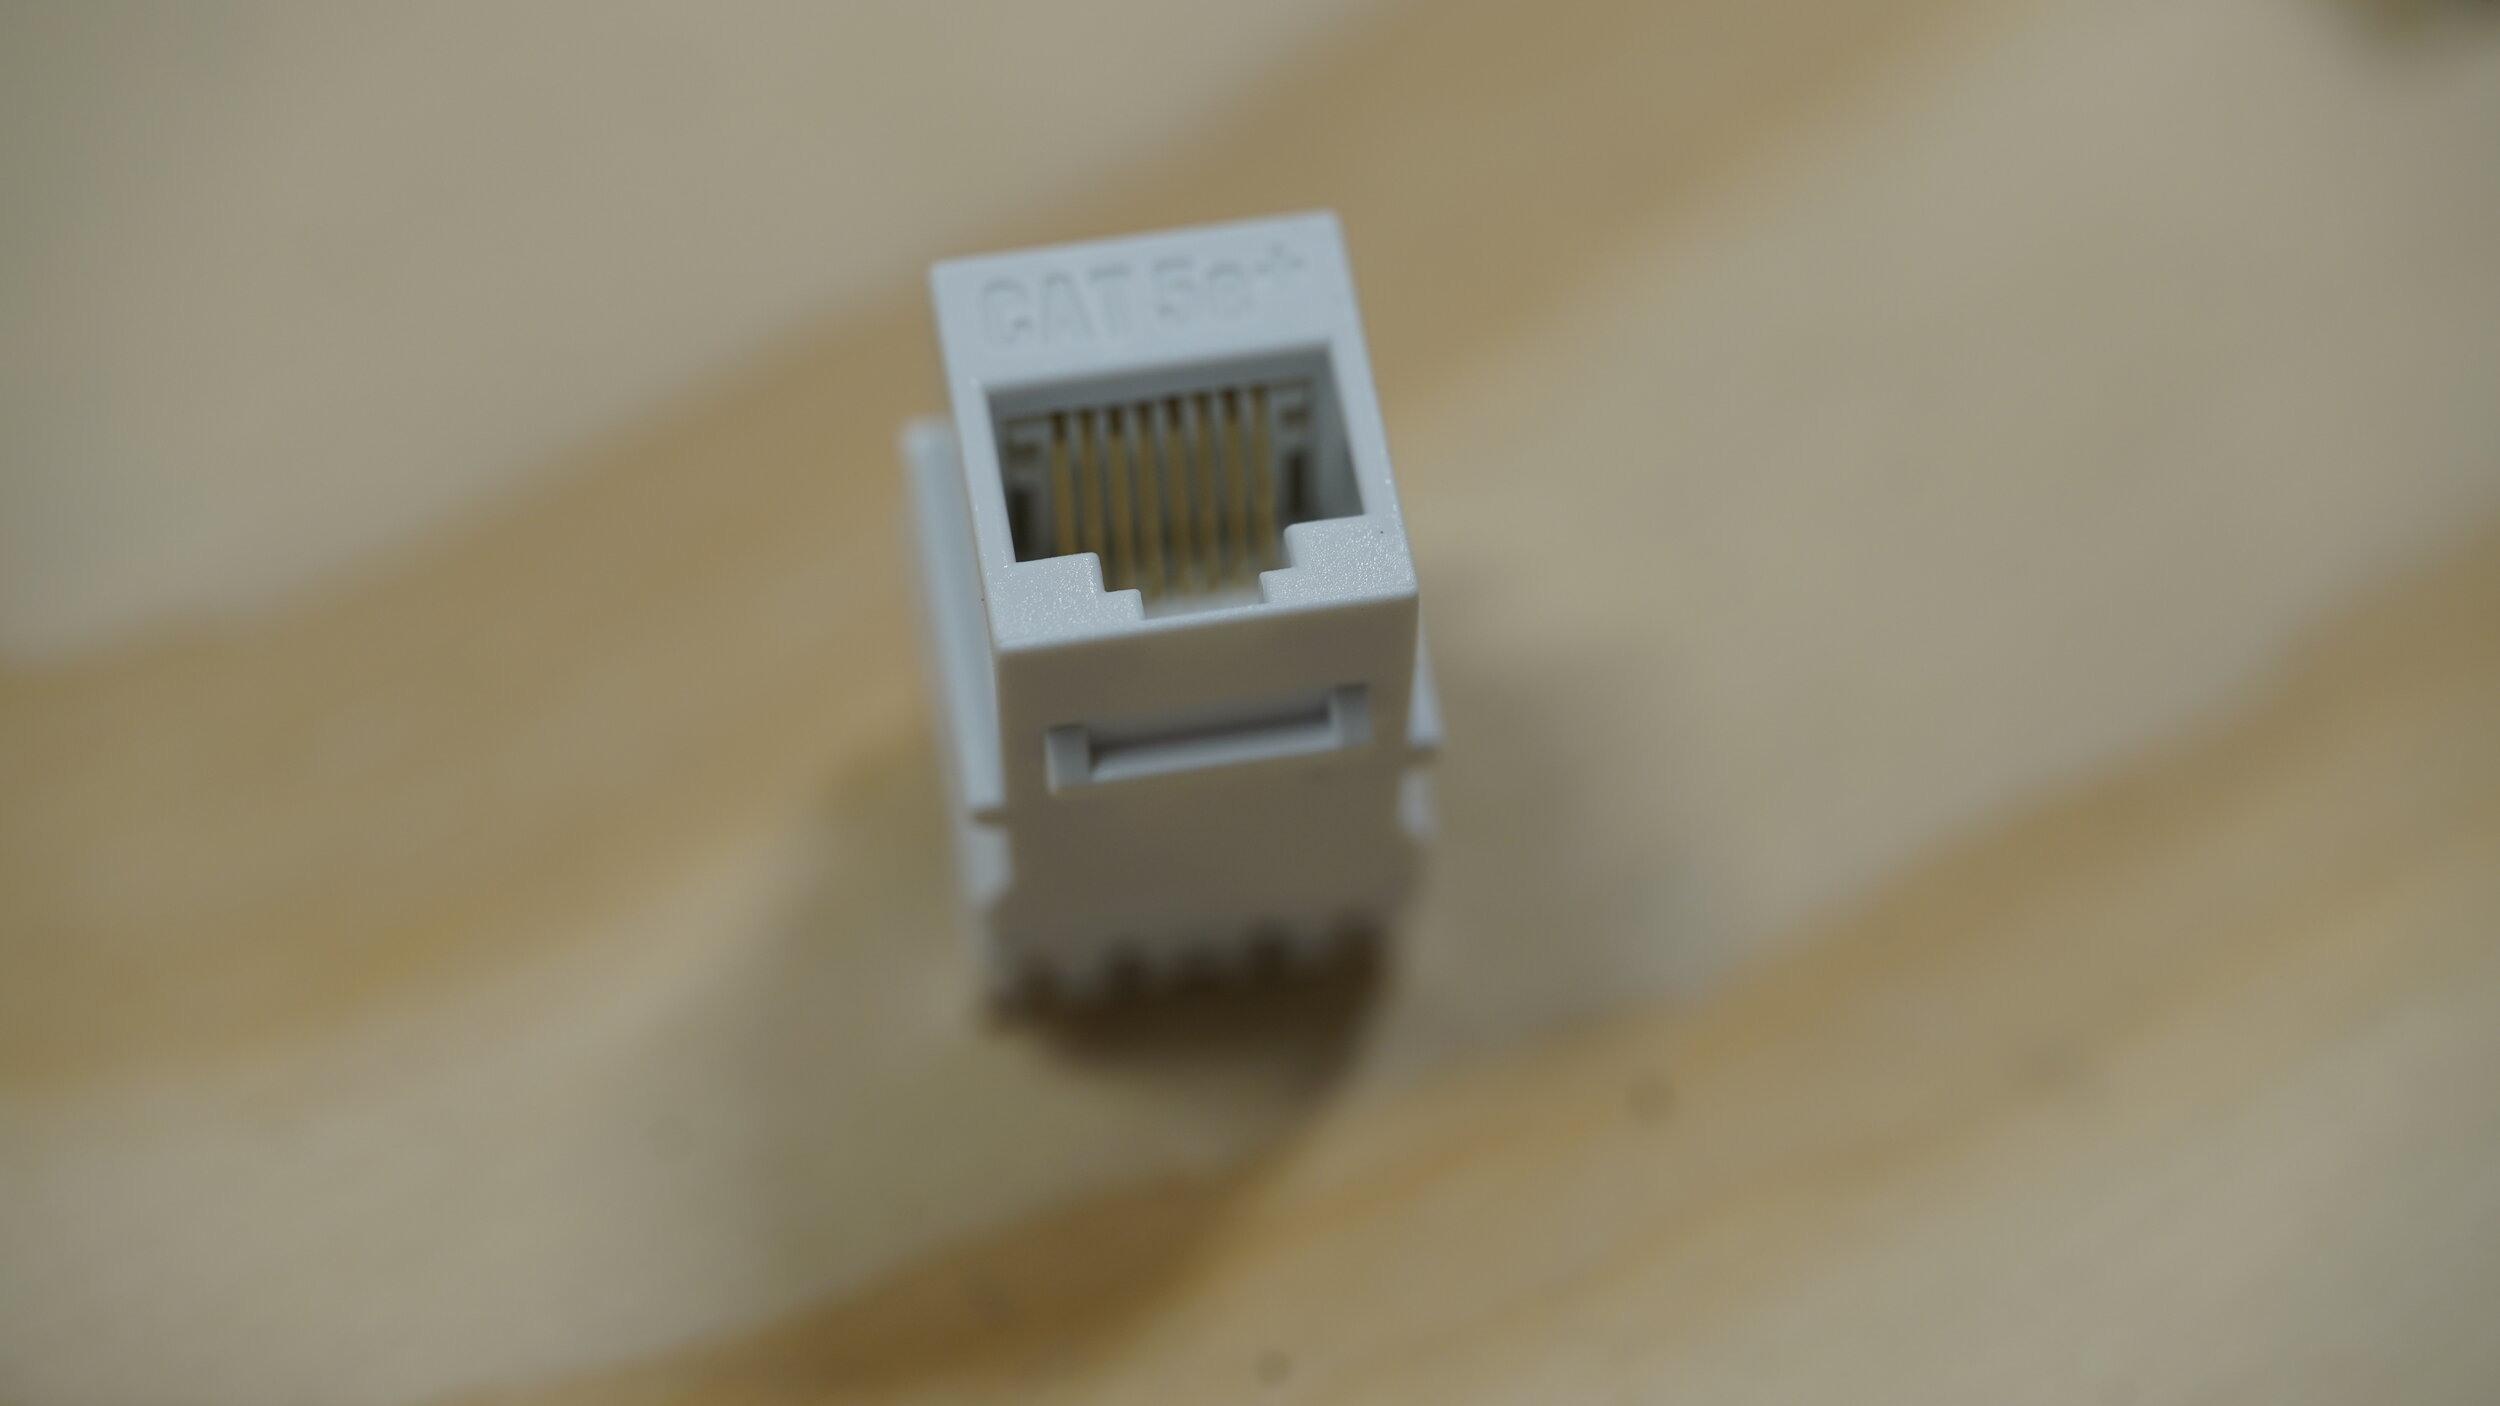 DSC00547.JPG